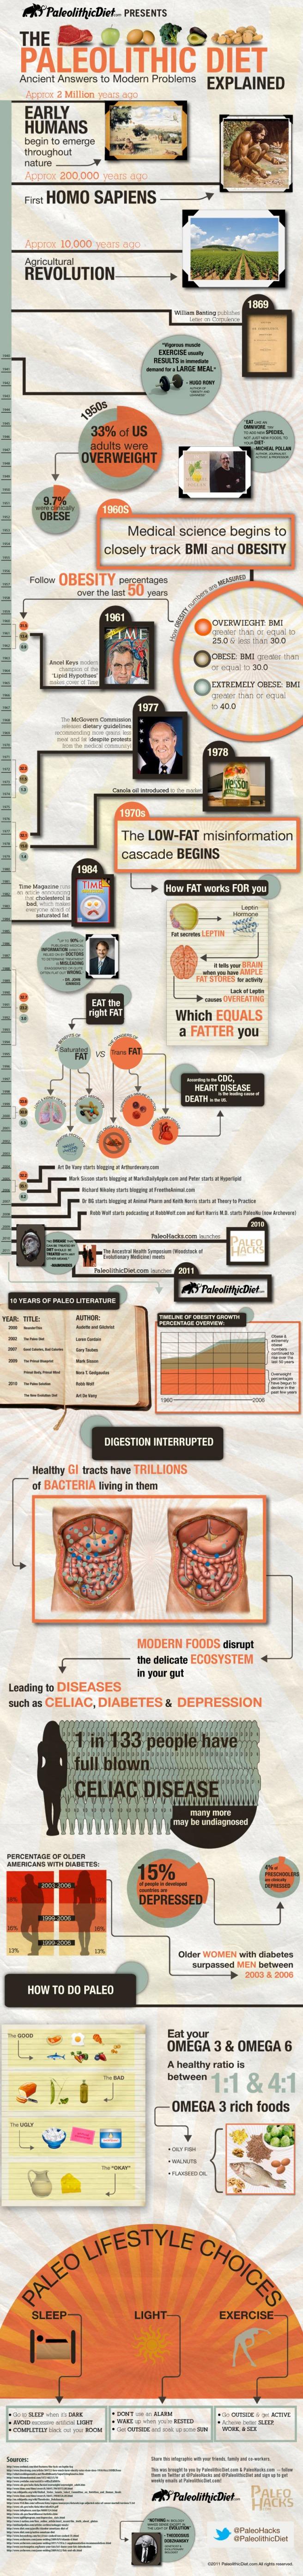 PaleolithicDietExplained-800original